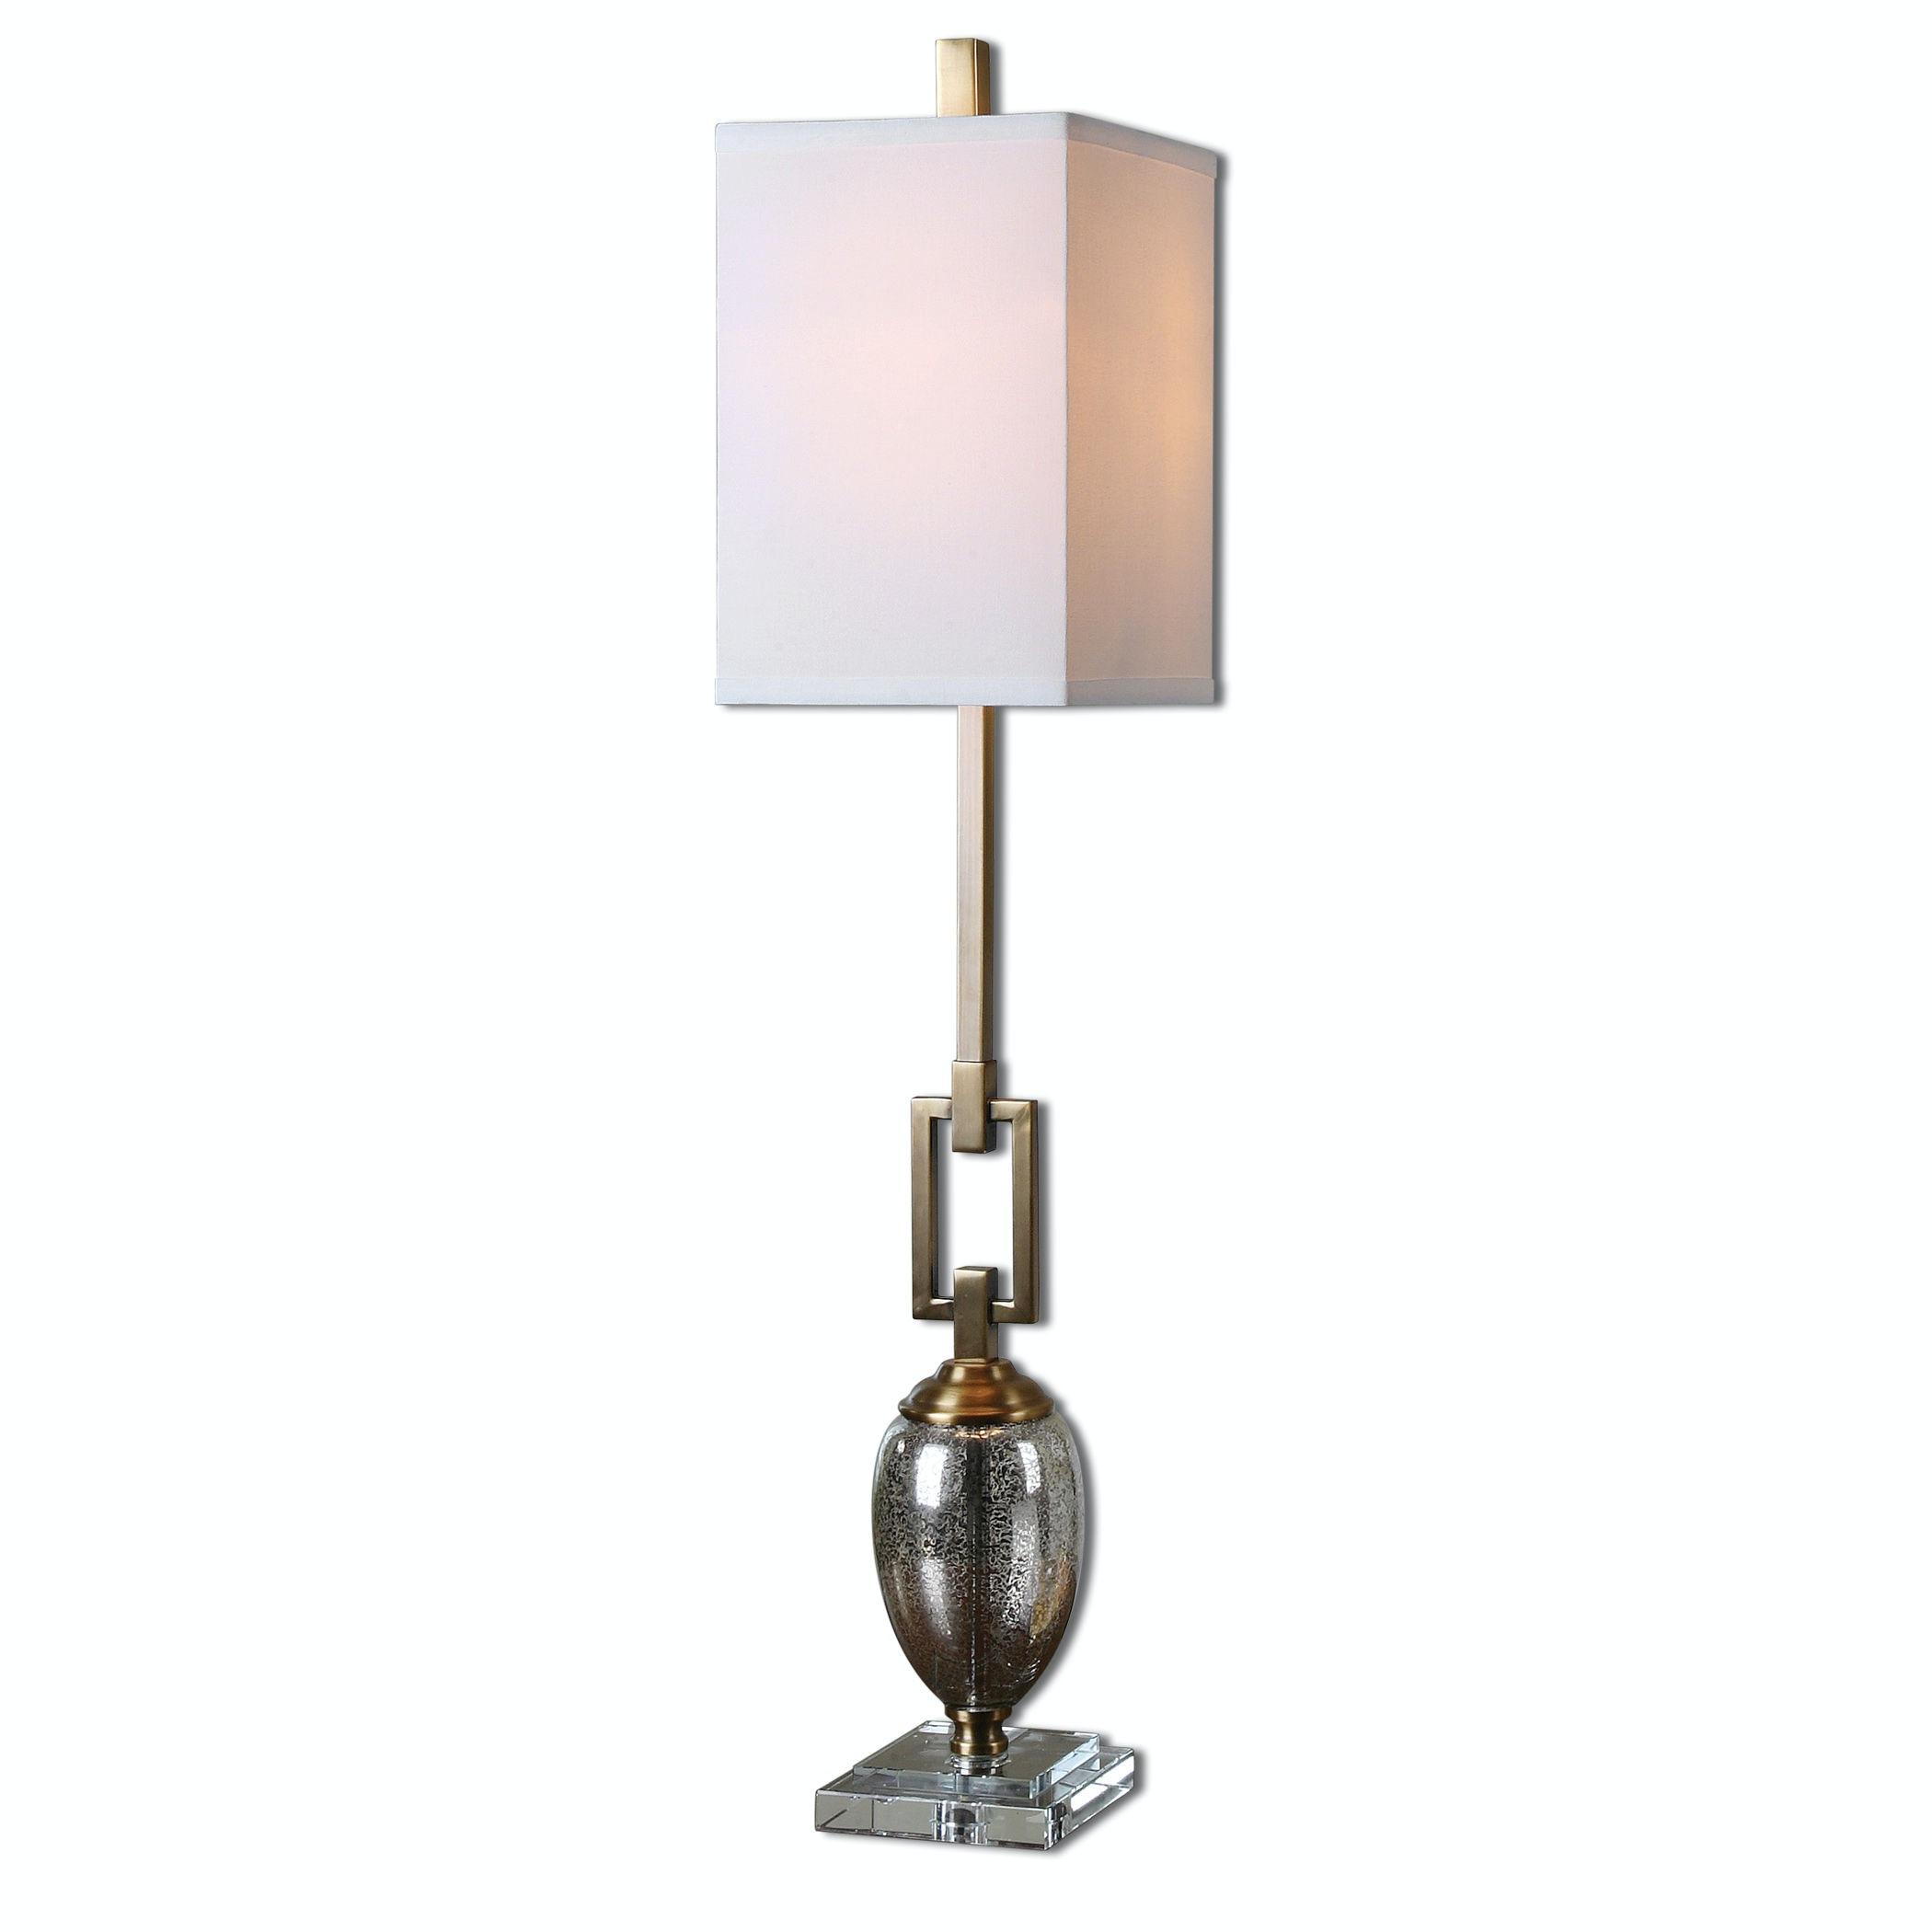 Mercury Lamps Walter Lighting Buffet Copeland UT293381 Lamp and Uttermost FurnitureDesign ESmithe Glass tsCQdoxBhr